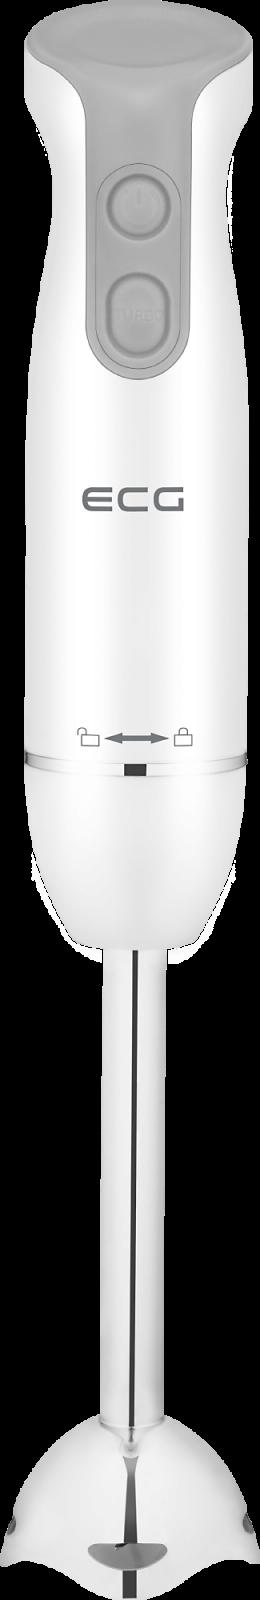 Блендер ECG RM-430